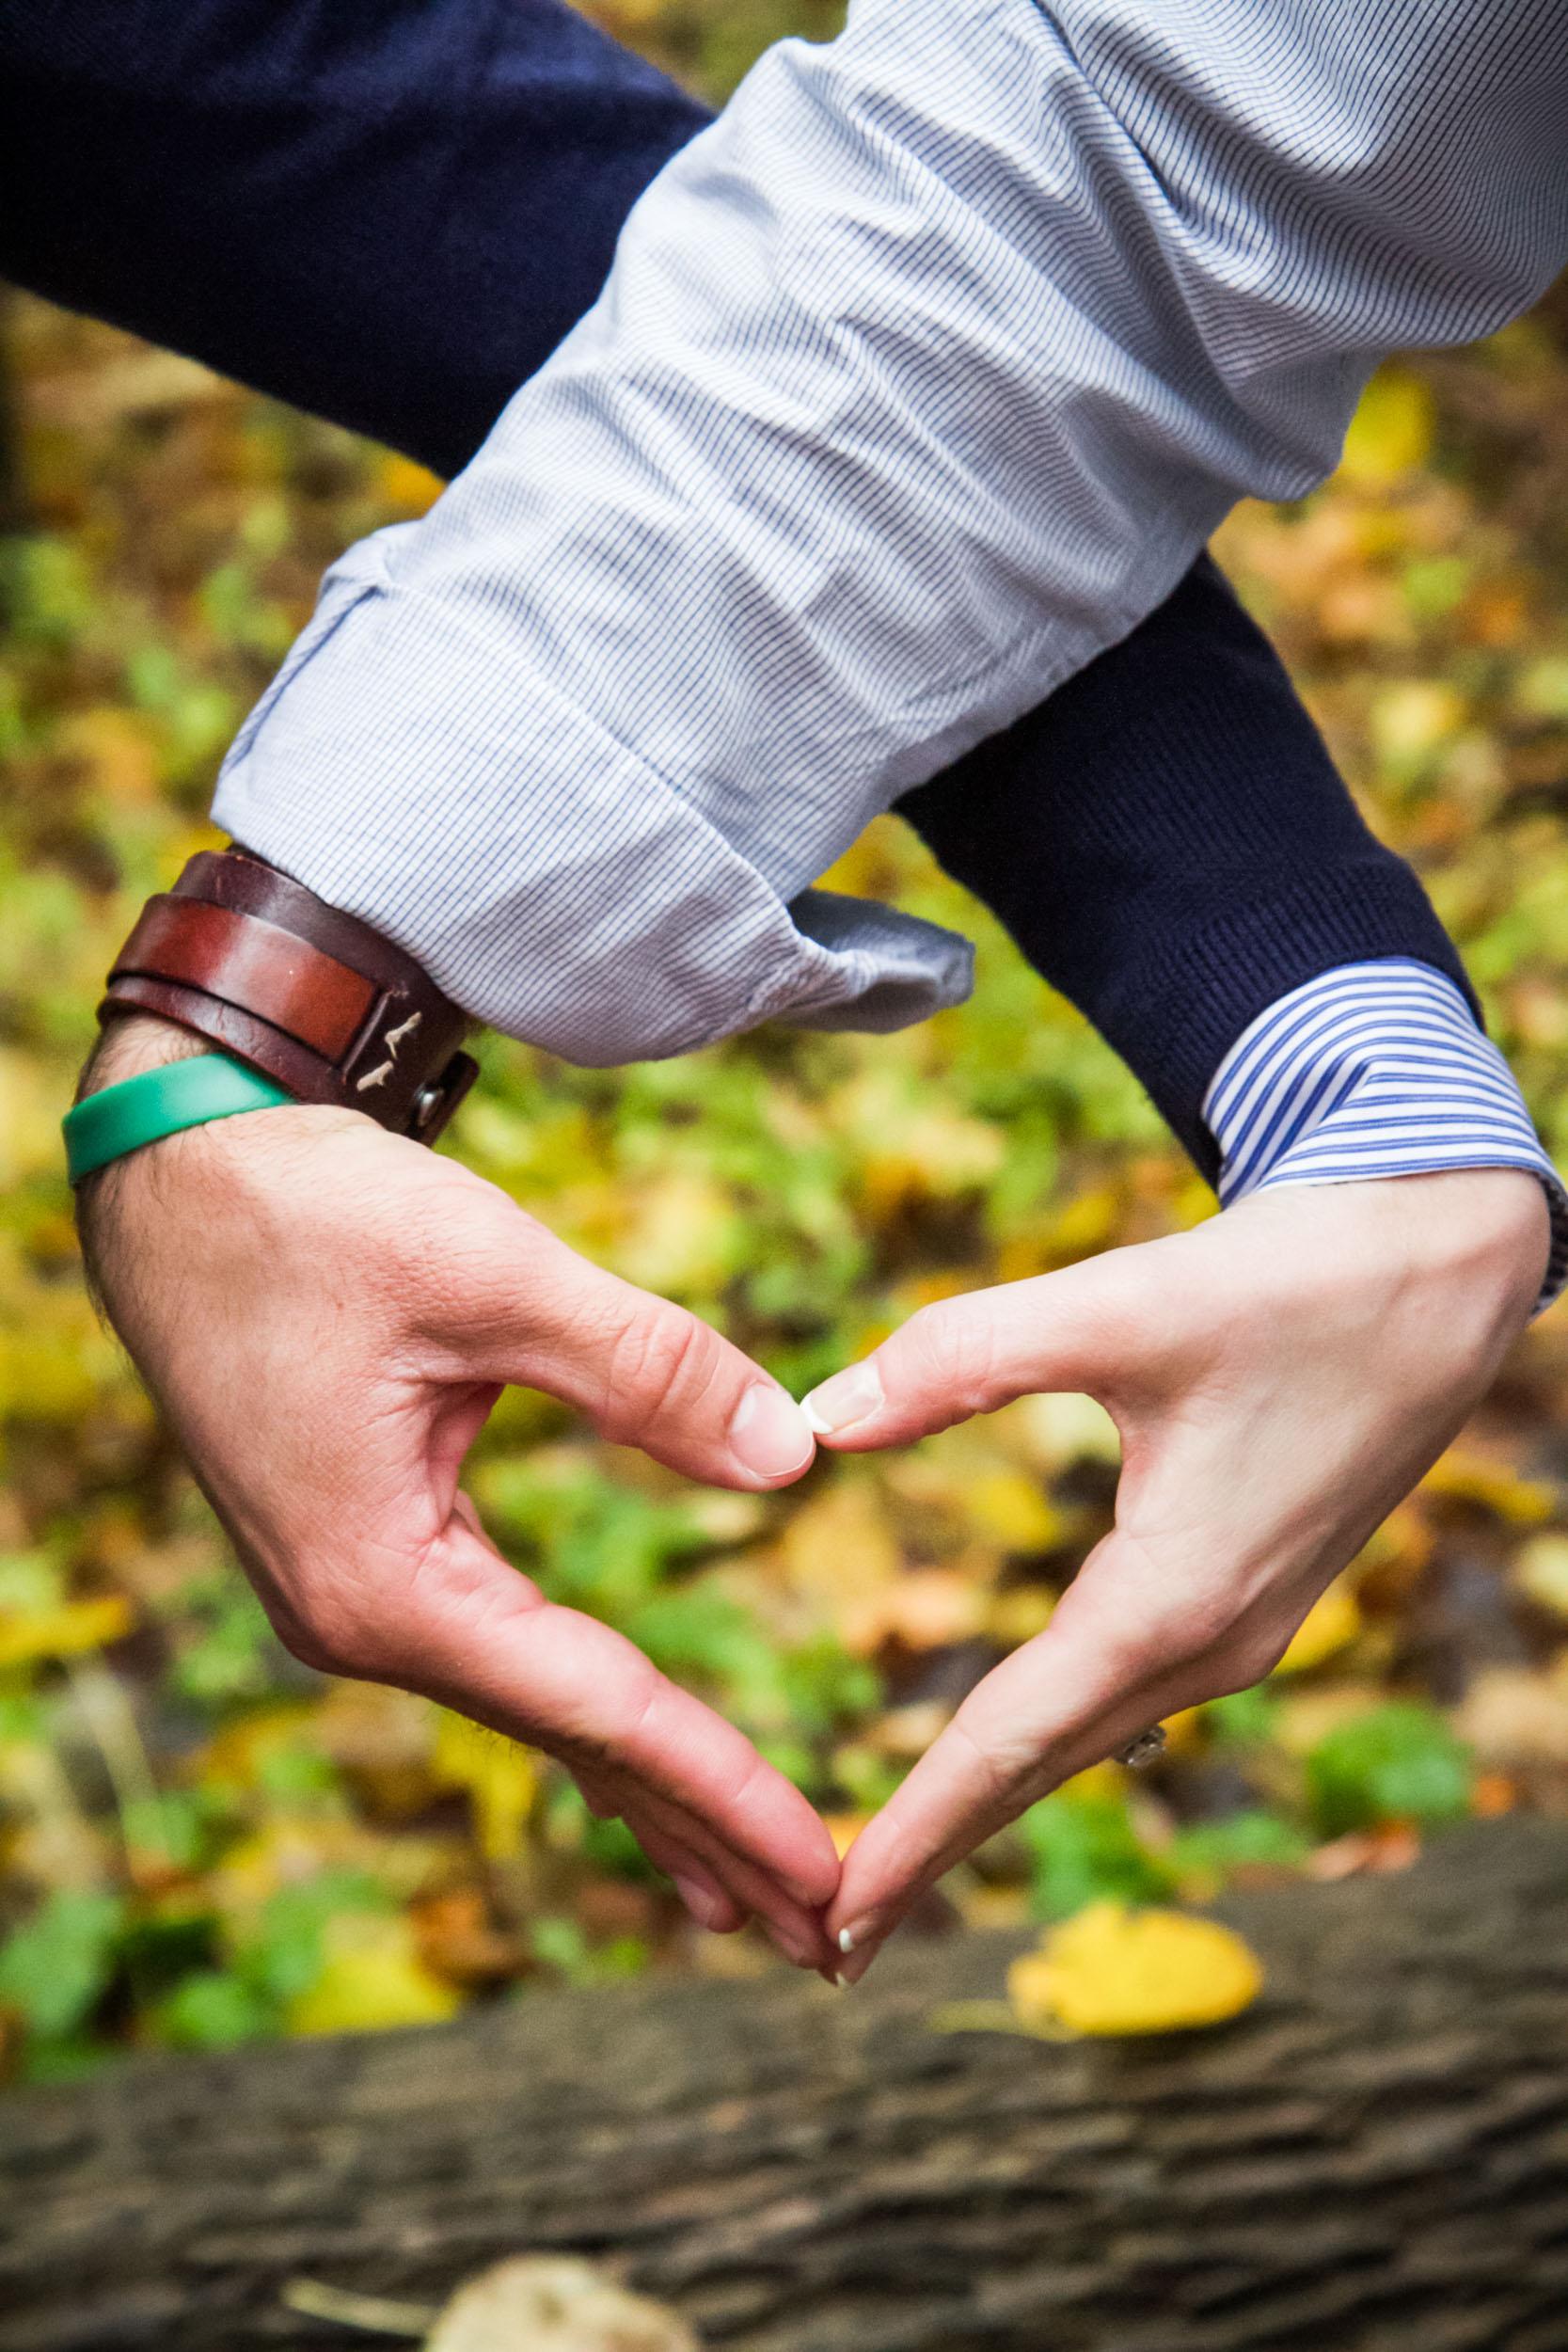 fall-engagement-photos-pamperin-park-green-bay-wisconsin--adam-shea-photography-green-bay-appleton-neenah-photographer.jpg